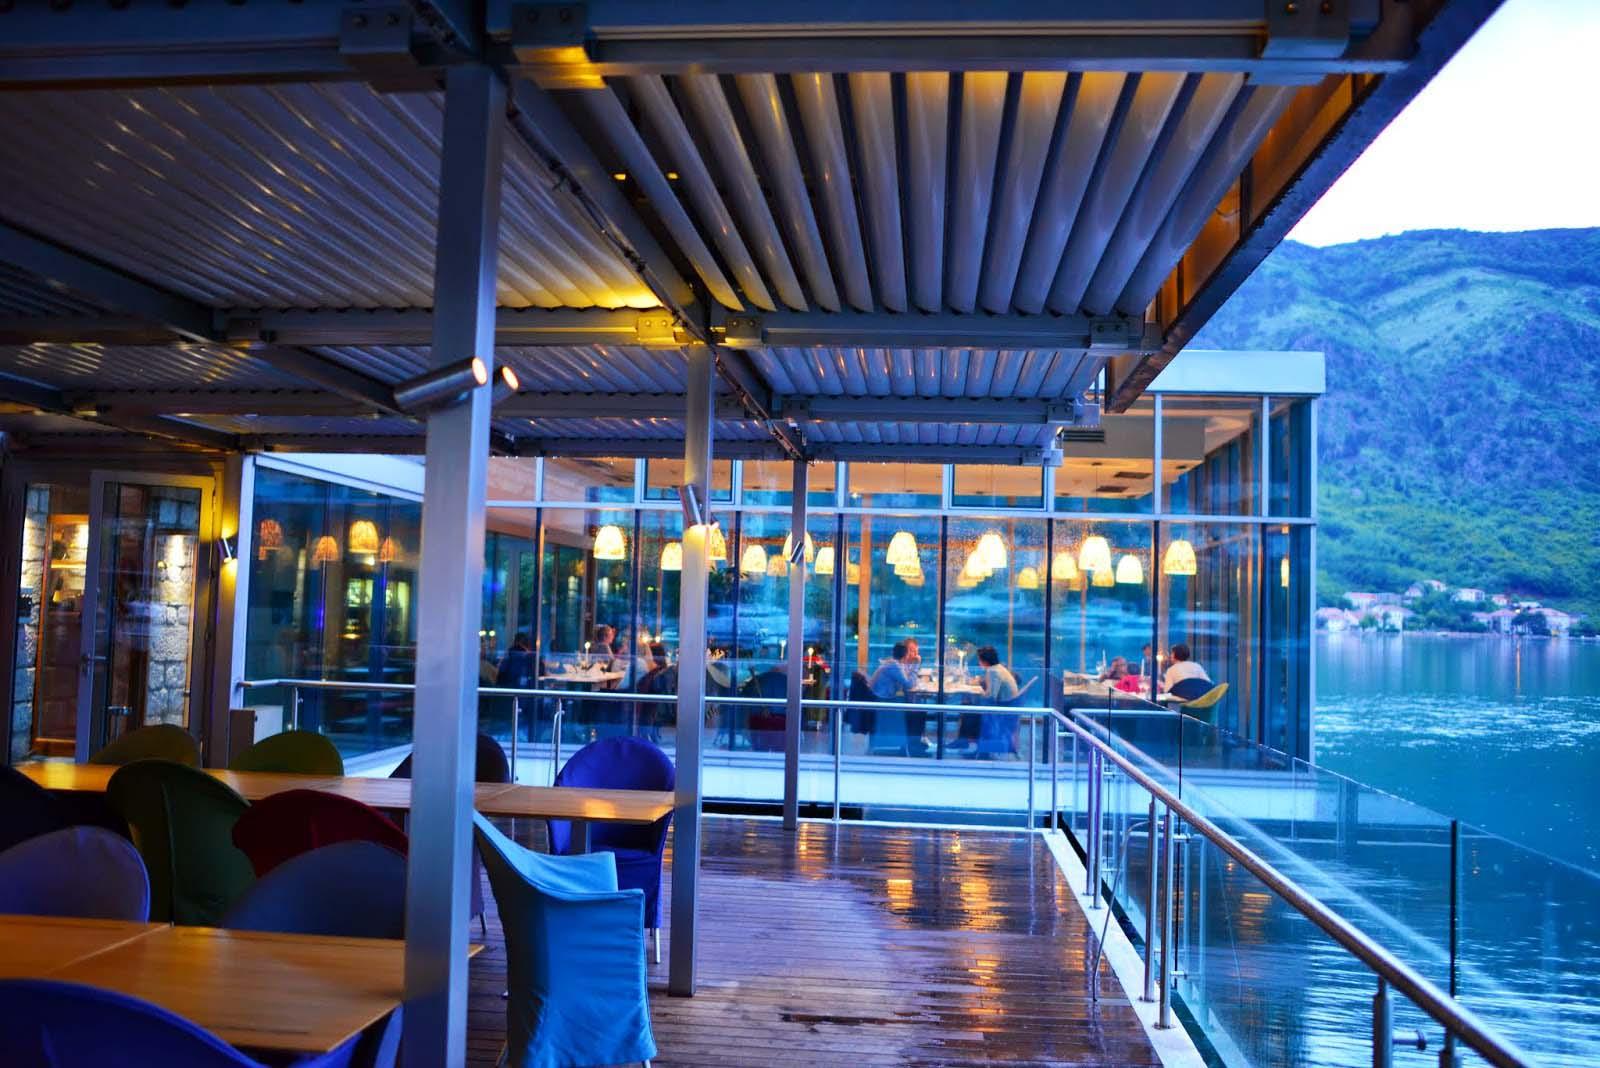 Restaurants Symphony Ltd The Best Travel Management Company